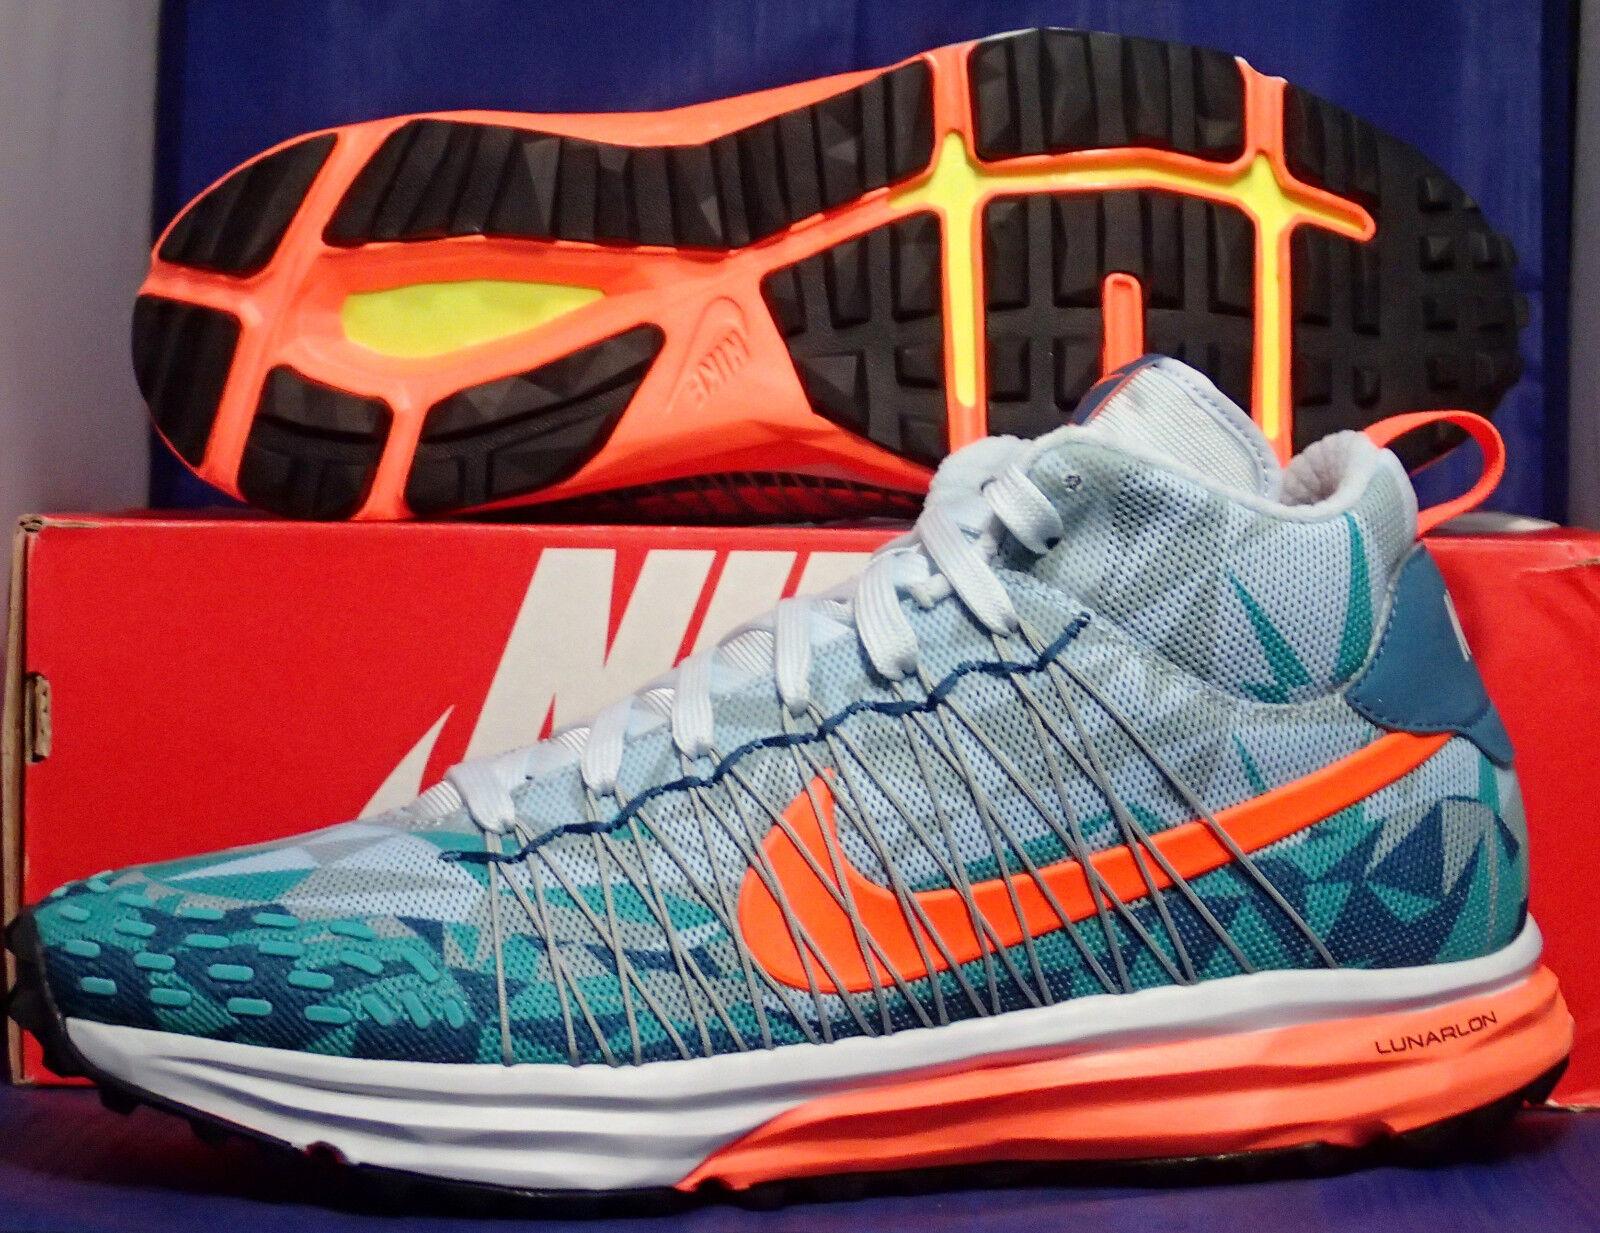 Nike Lunarfresh SneakerBotas la Antártida (684724401) Azul Naranja Tamaño 10 (684724401) Antártida 8f694e